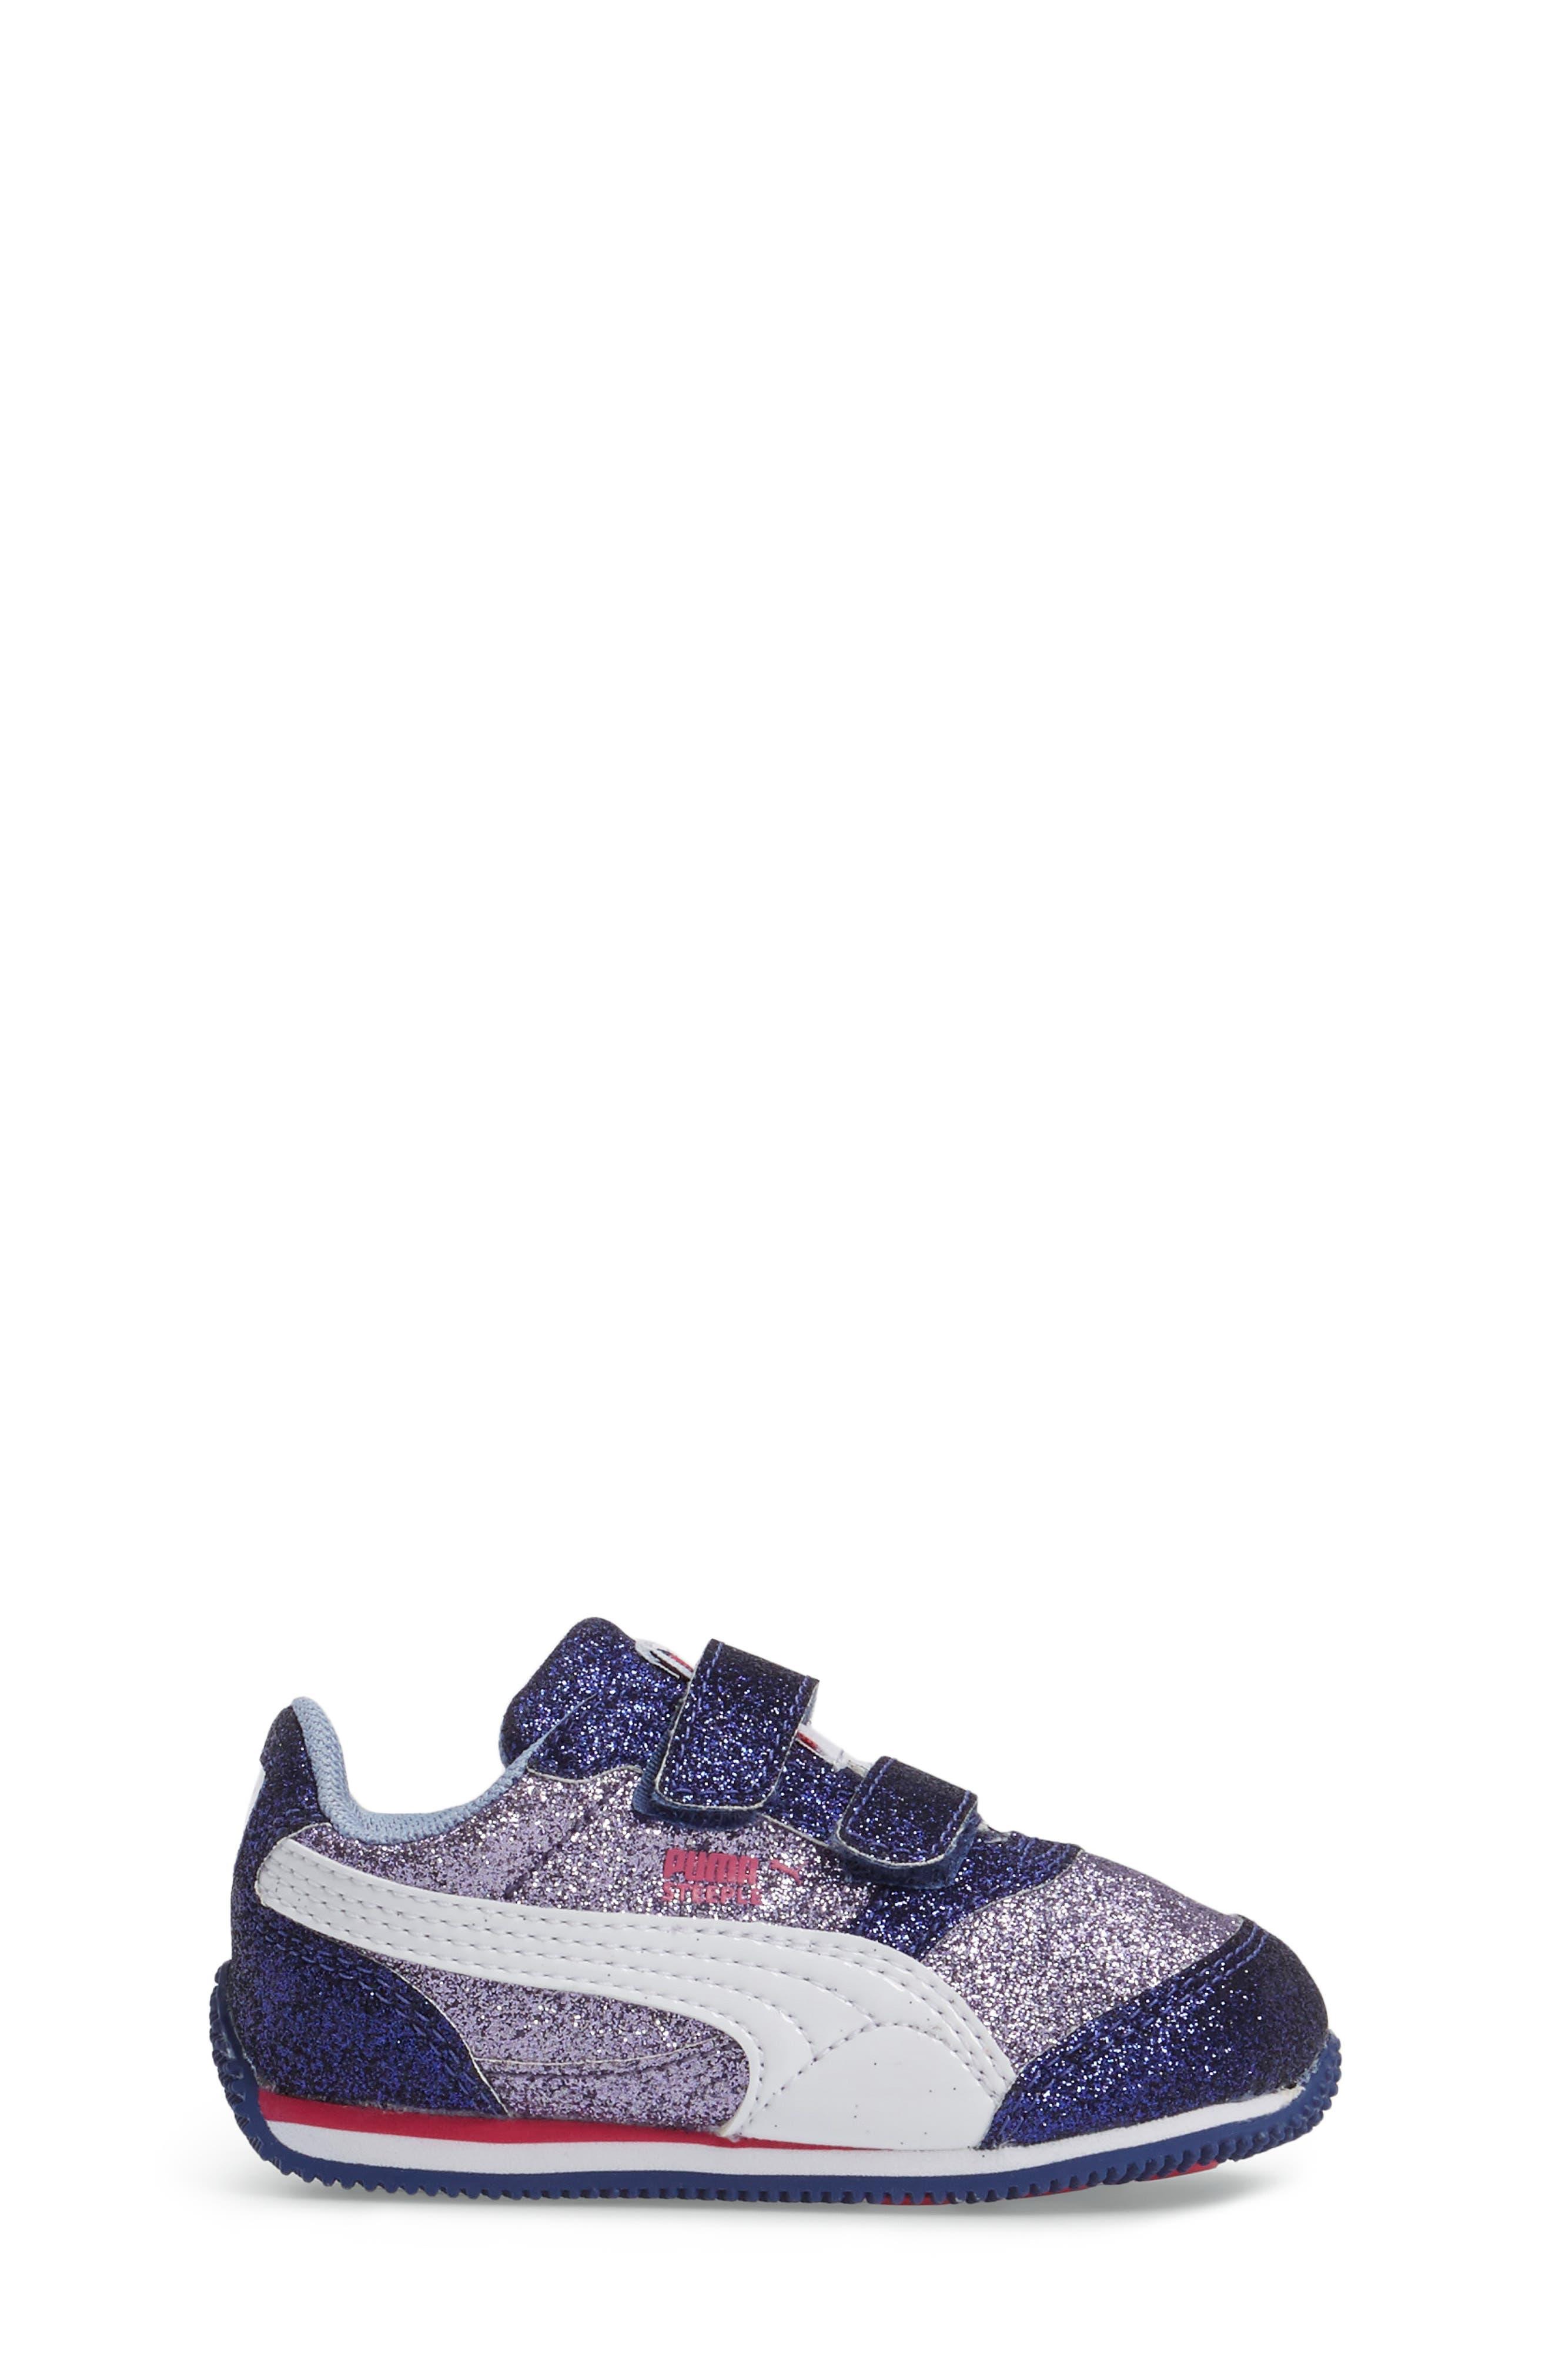 Steeple Glitz Glam Sneaker,                             Alternate thumbnail 3, color,                             500